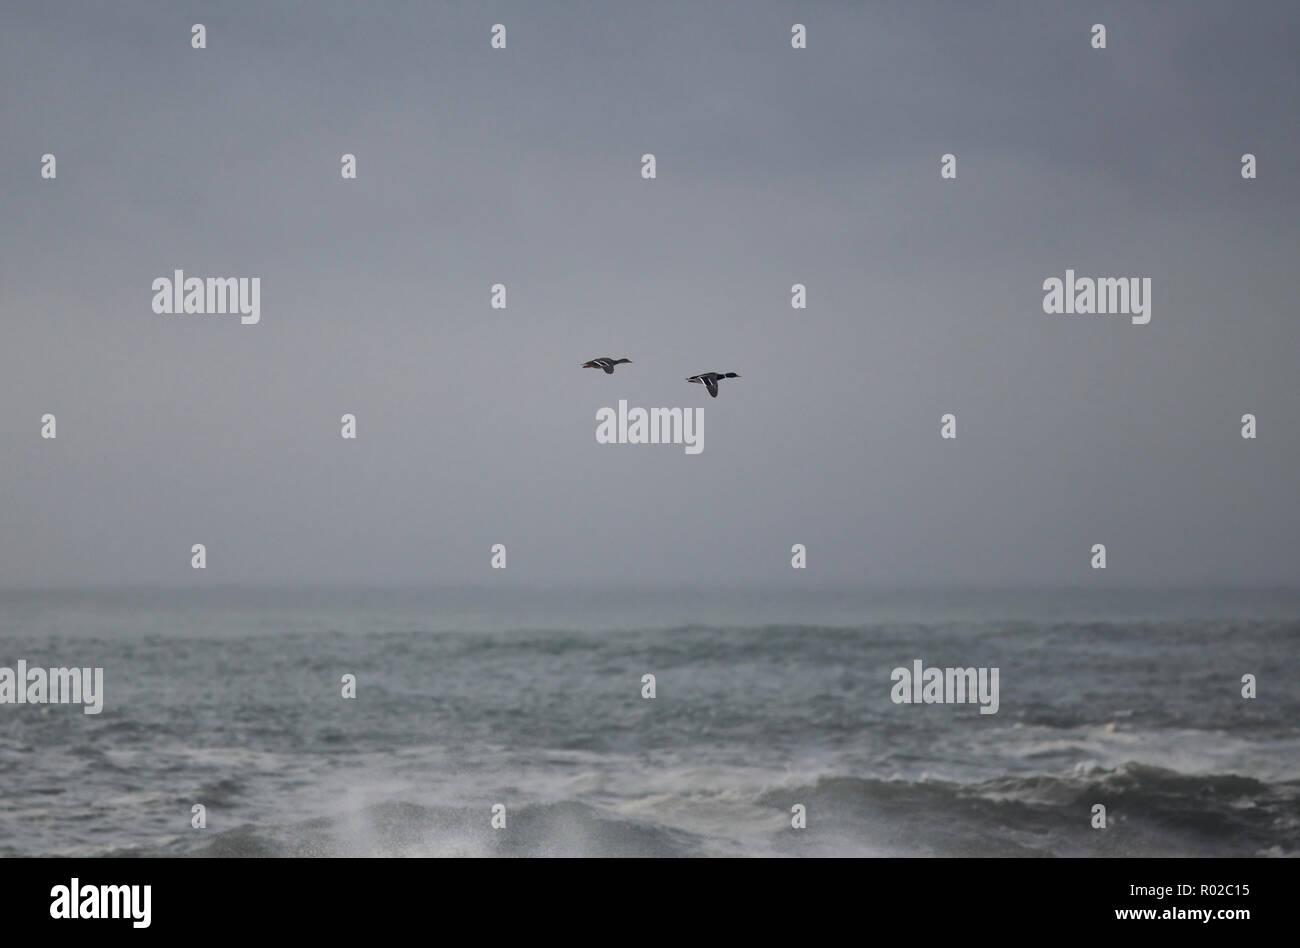 Two ducks in flight over northern portuguese sea coast against dark sky - Stock Image